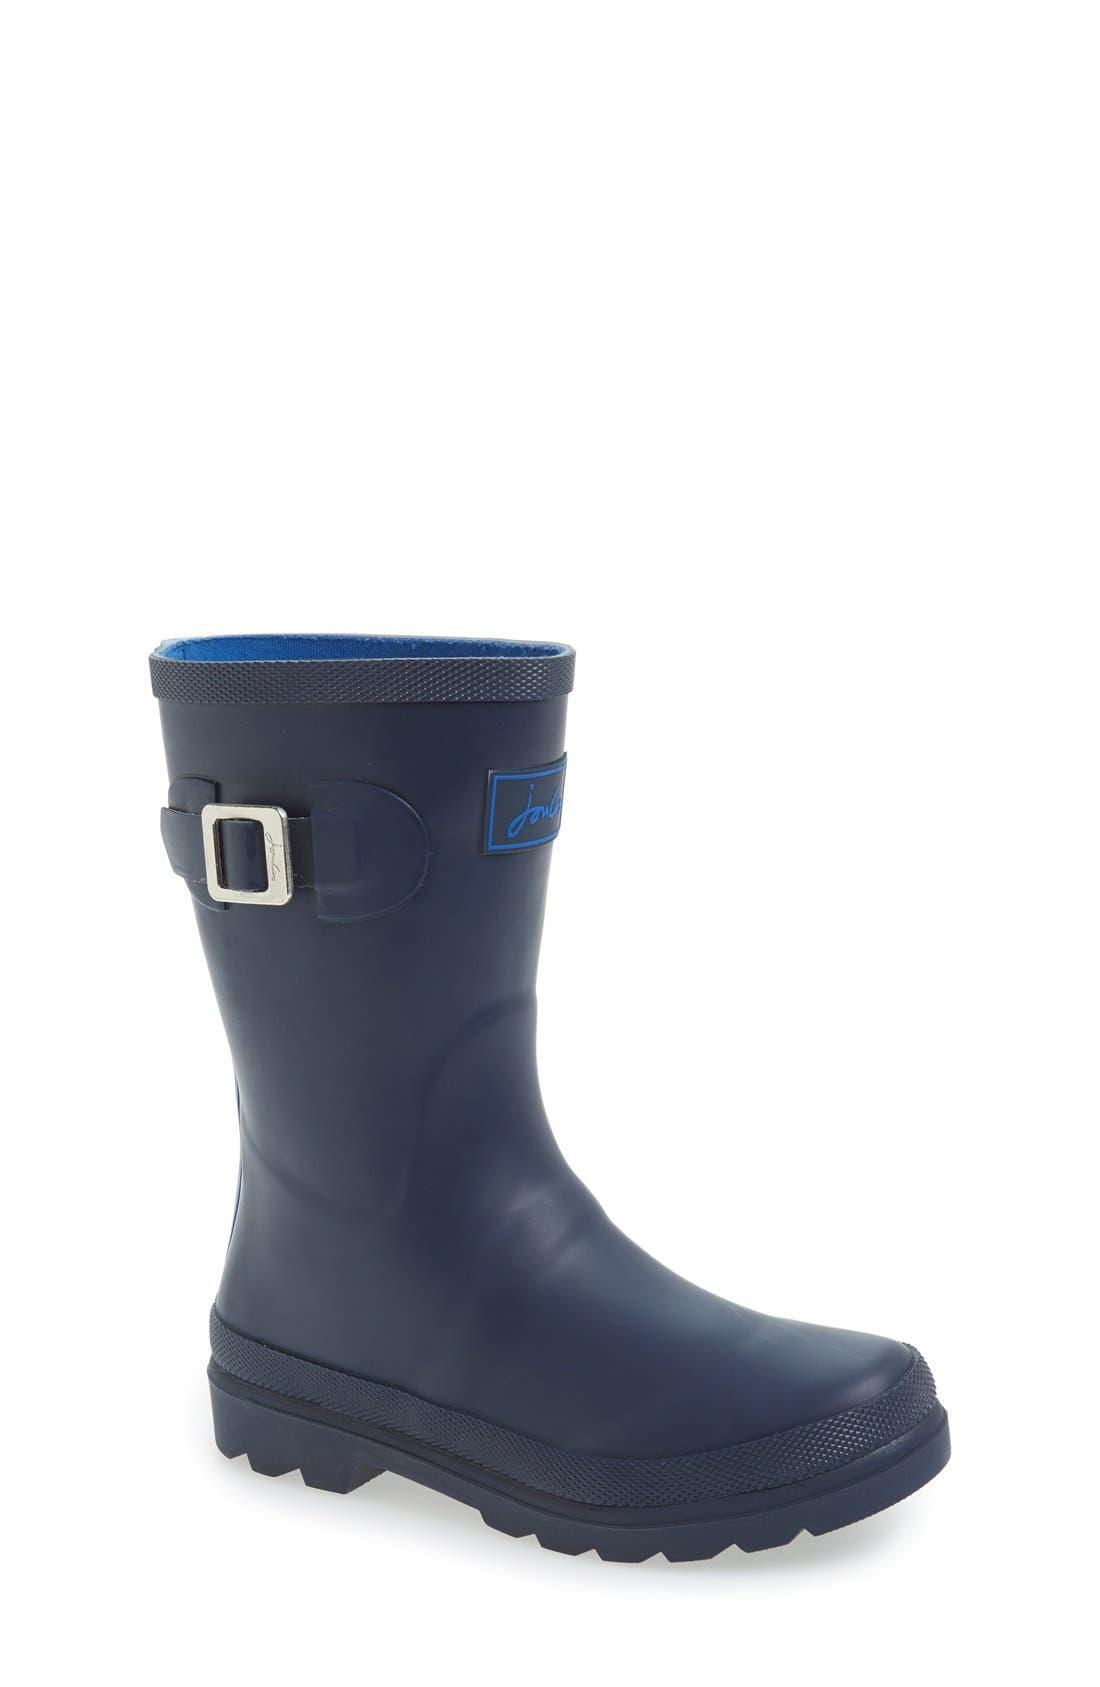 Joules 'Field Welly' Rain Boot (Walker, Toddler, Little Kid & Big Kid)